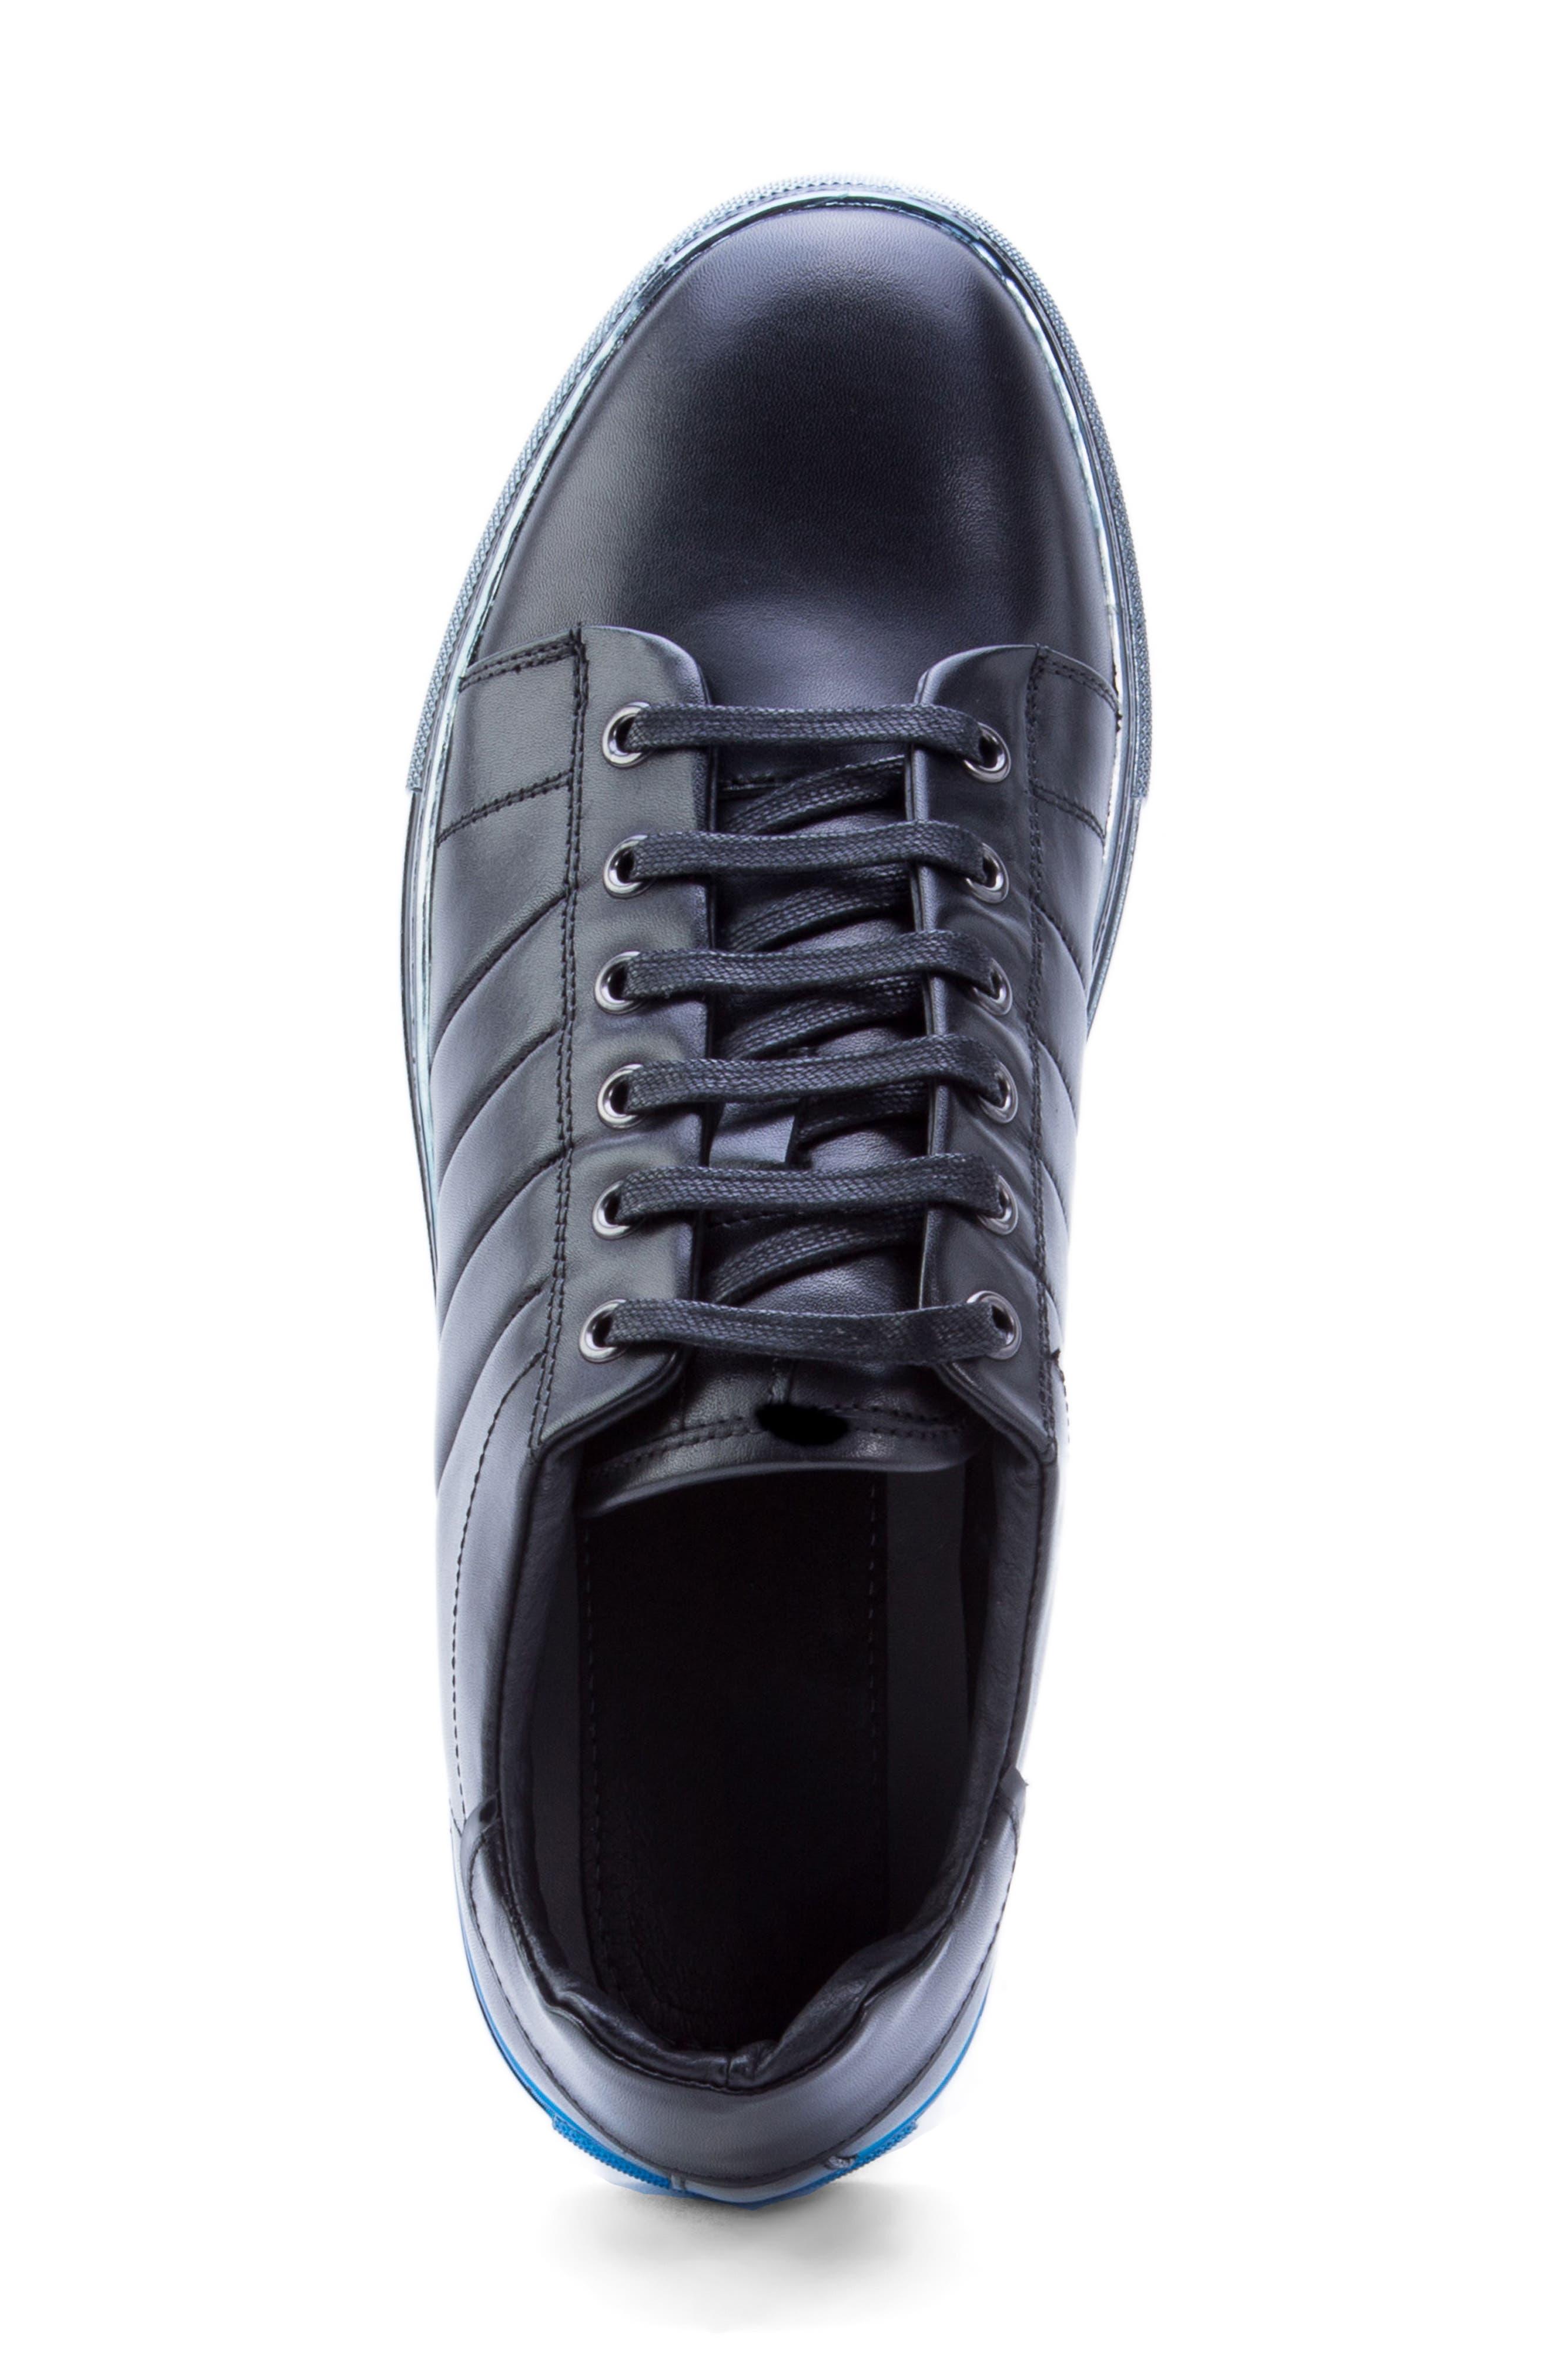 BADGLEY MISCHKA COLLECTION, Badgley Mischka Brando Sneaker, Alternate thumbnail 5, color, BLACK LEATHER